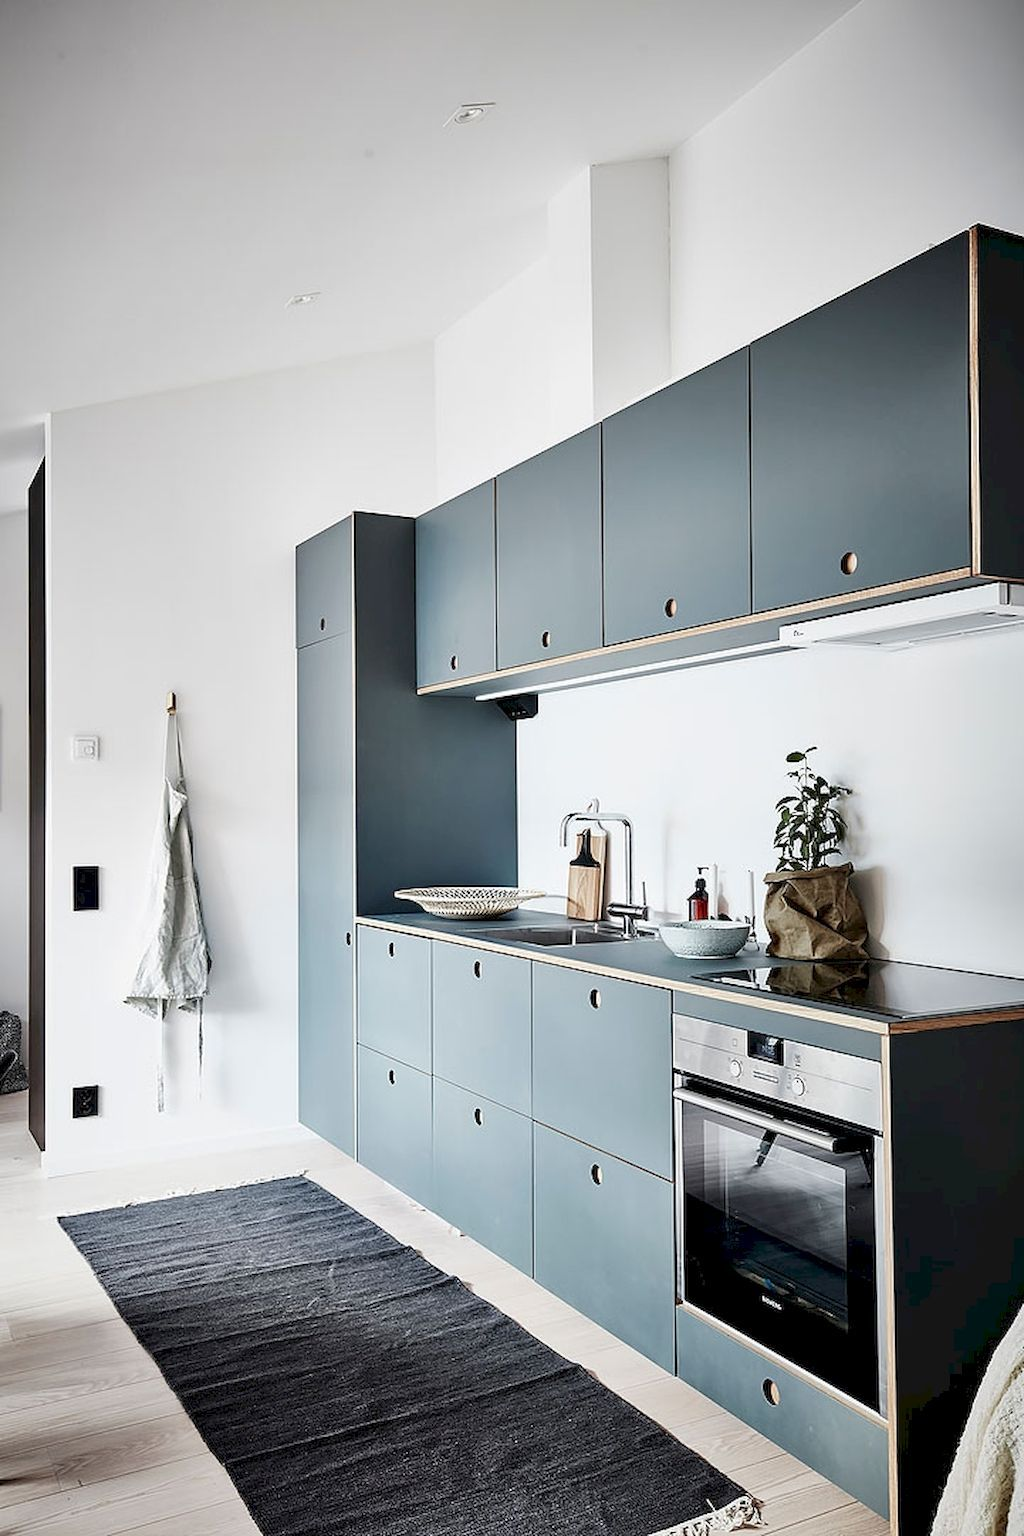 80 Small Kitchen Design & Organization Ideas   Kitchens, Kitchen ...